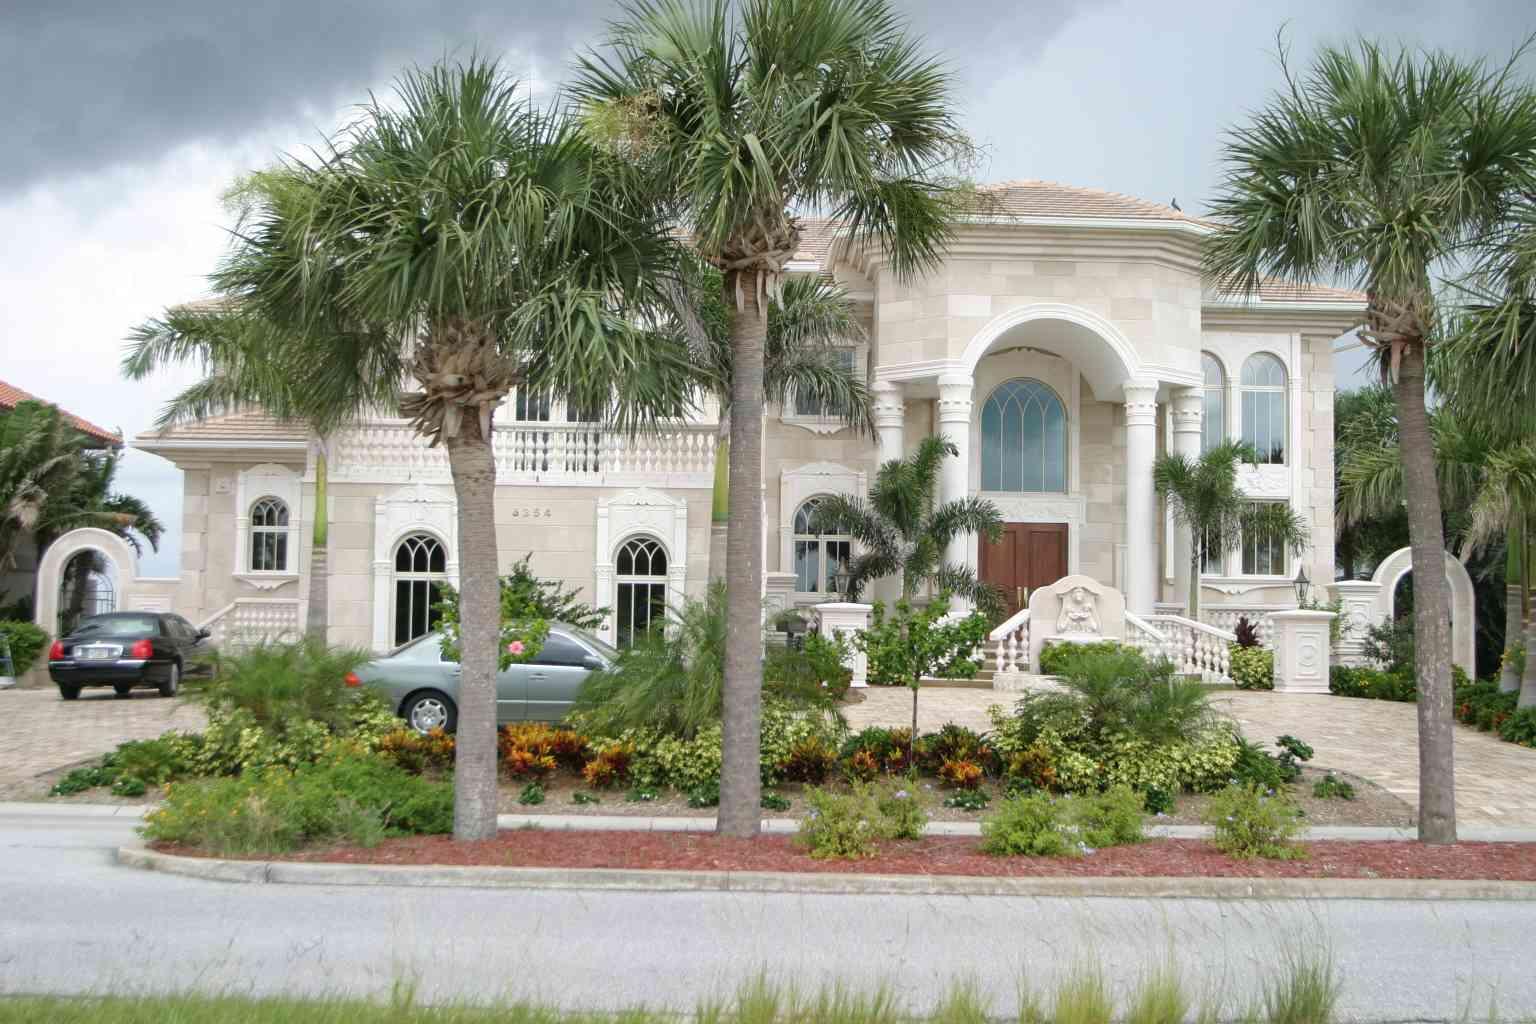 Custom Coastal Zone Home - Imported Tile Facade